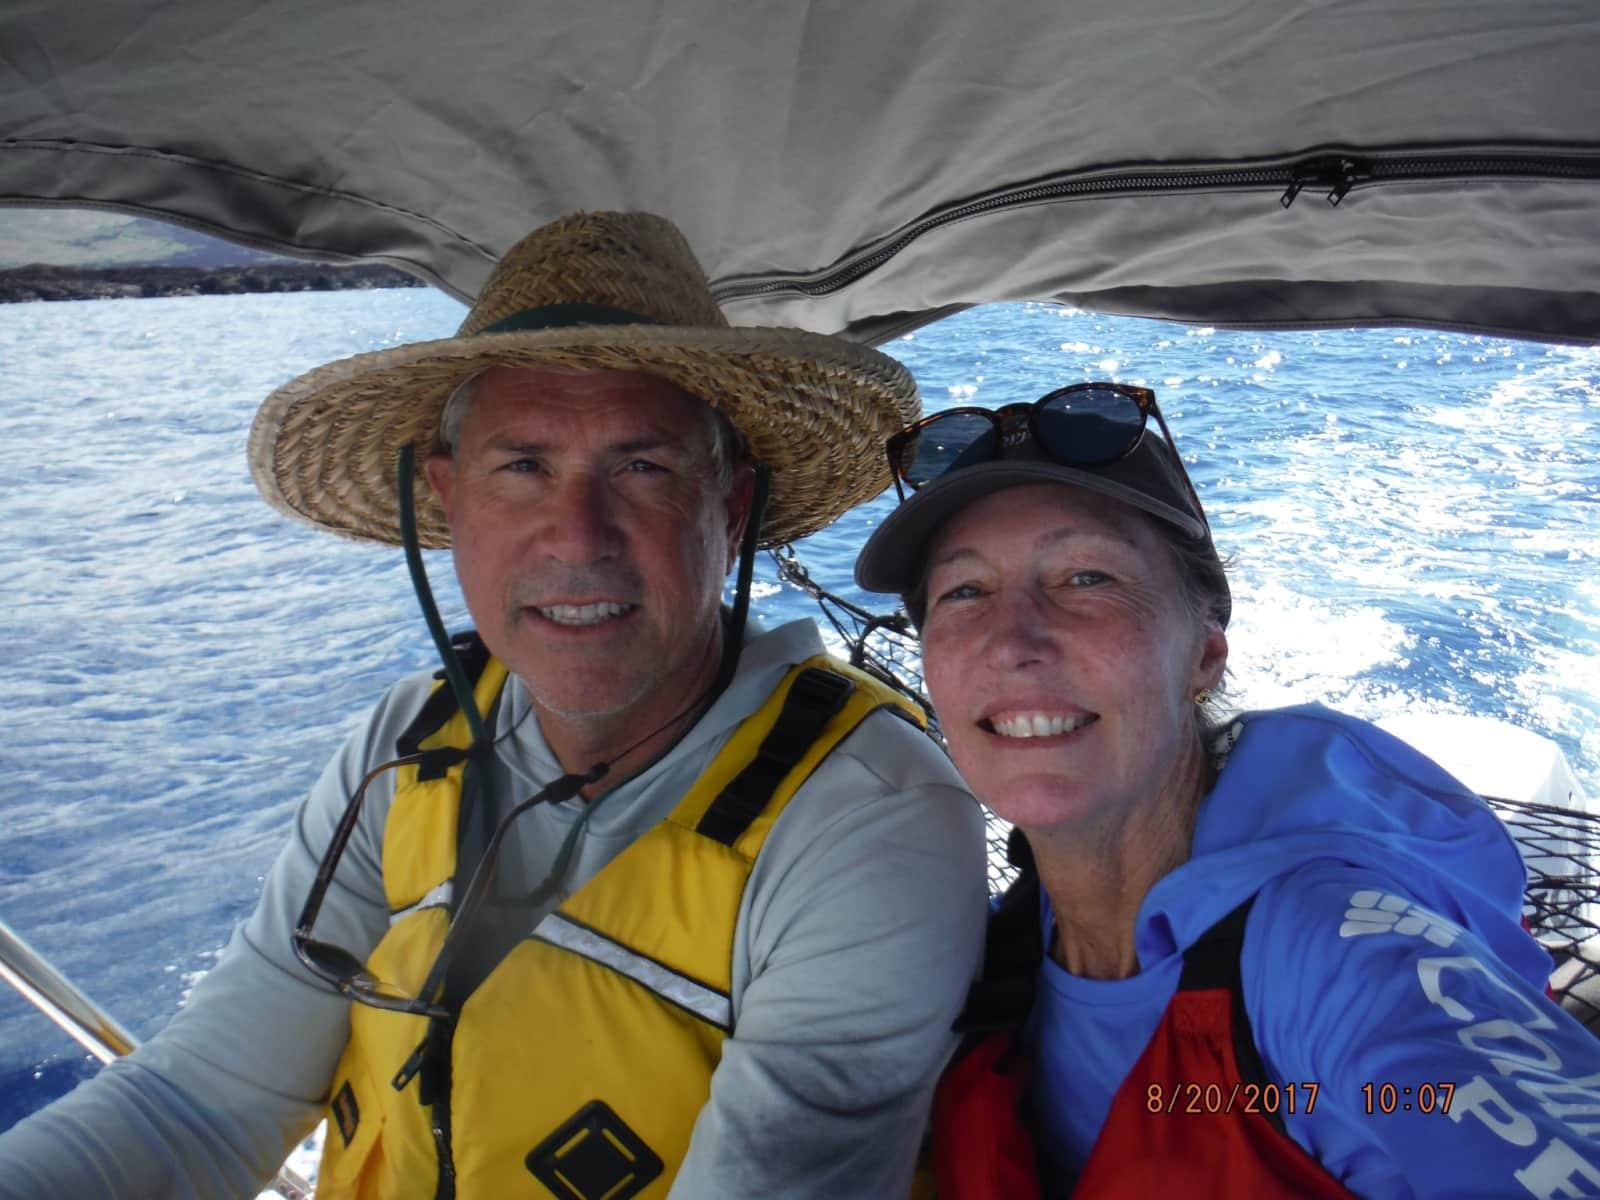 Lori from Kula, Hawaii, United States